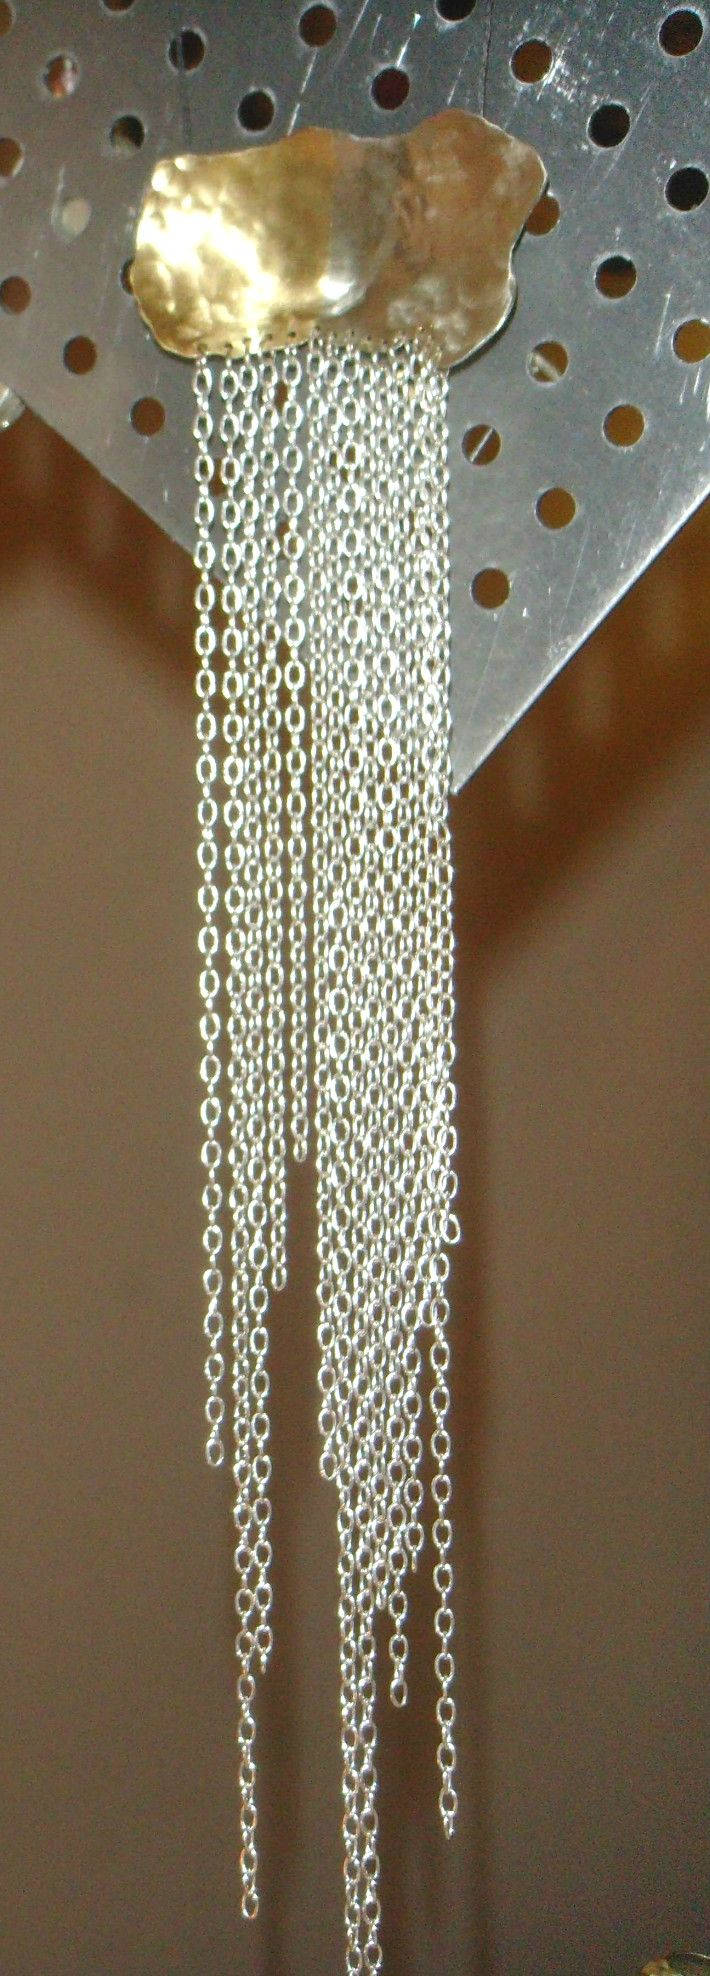 metallic pendant. by Efstathia.